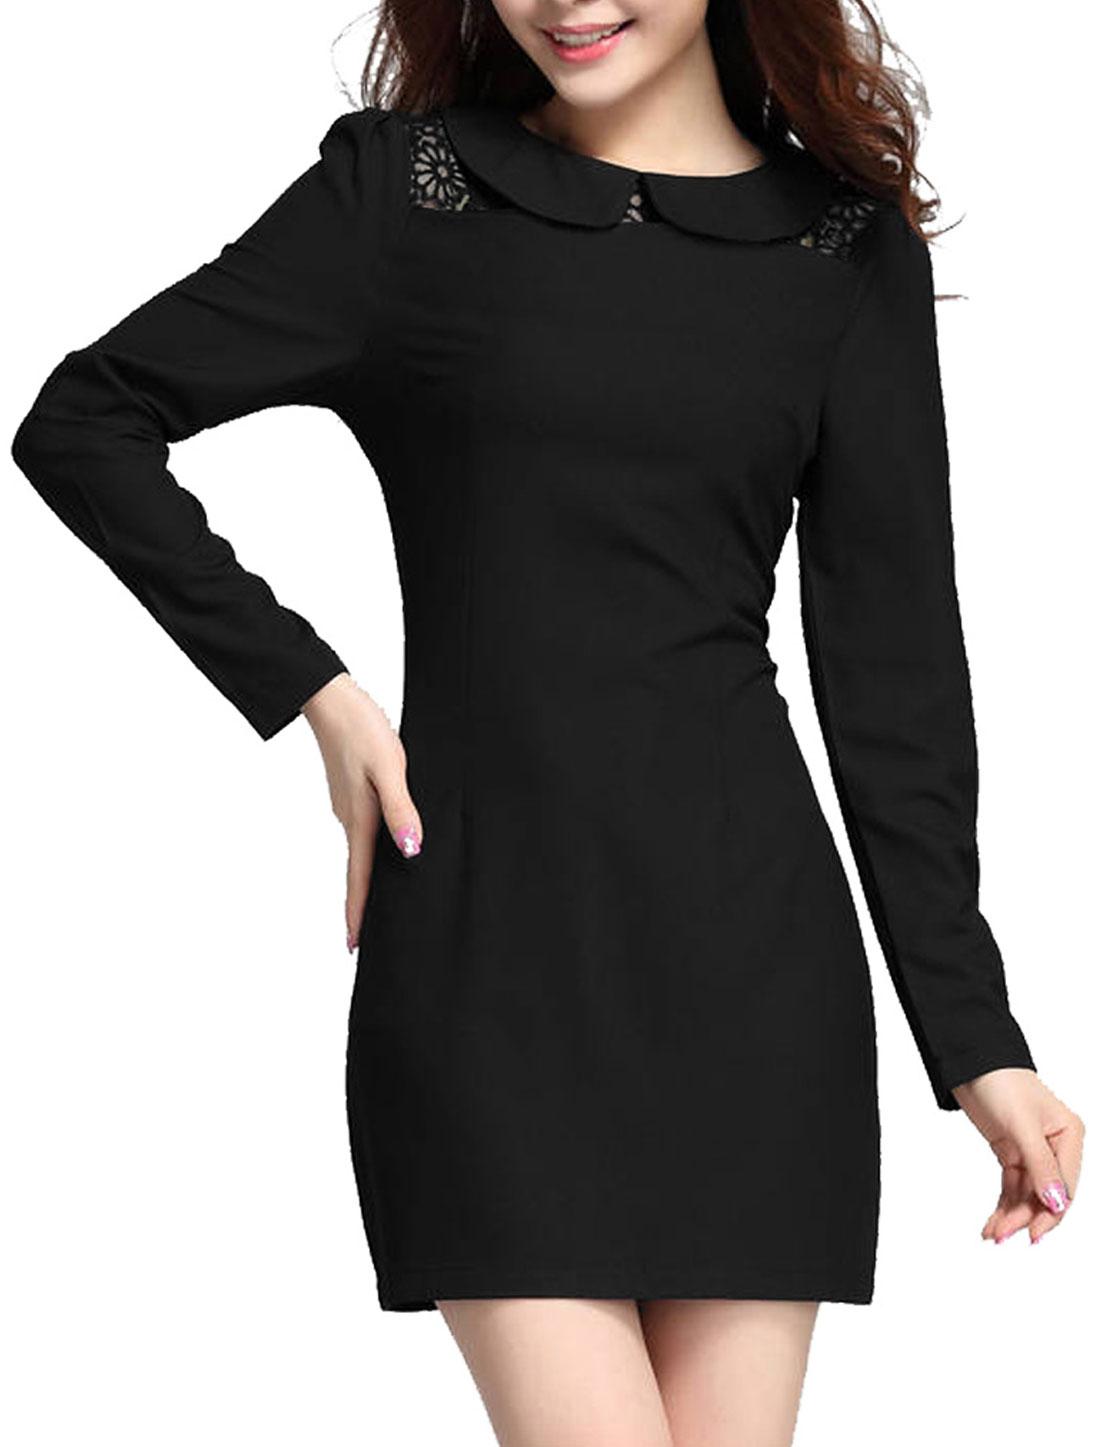 Ladies Doll Collar Long Sleeve Mesh Splice Shift Dress Black XS